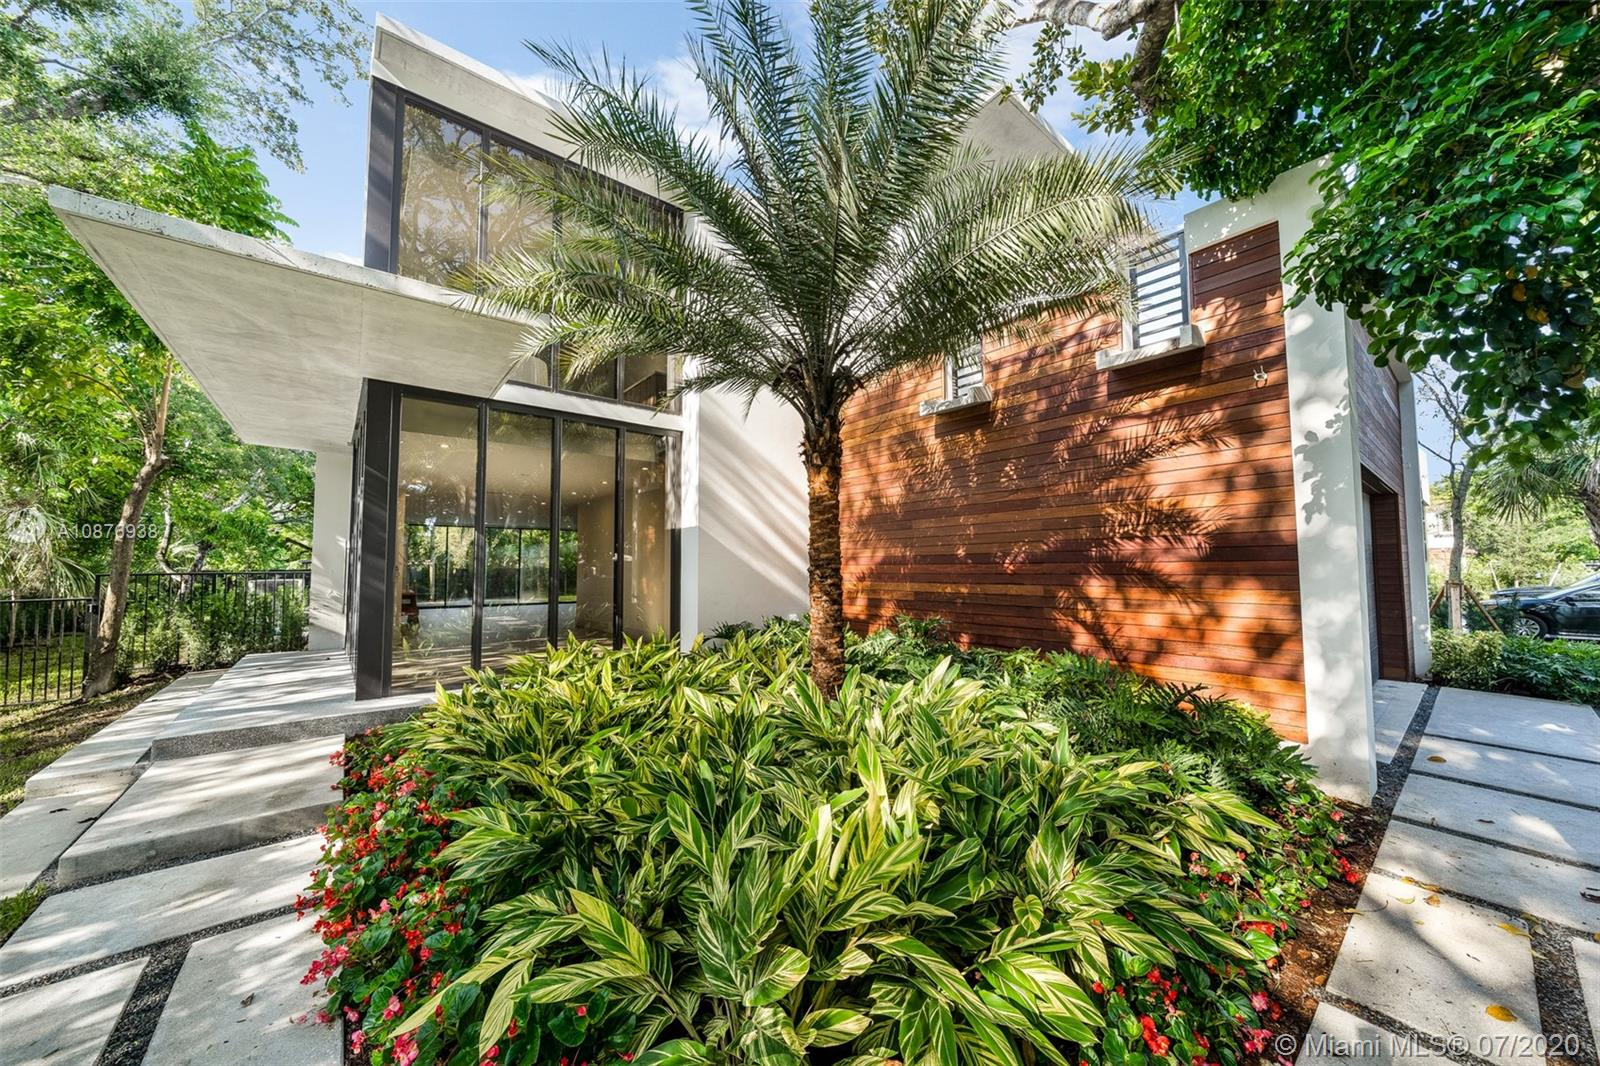 Palm Miami Heights # - 01 - photo